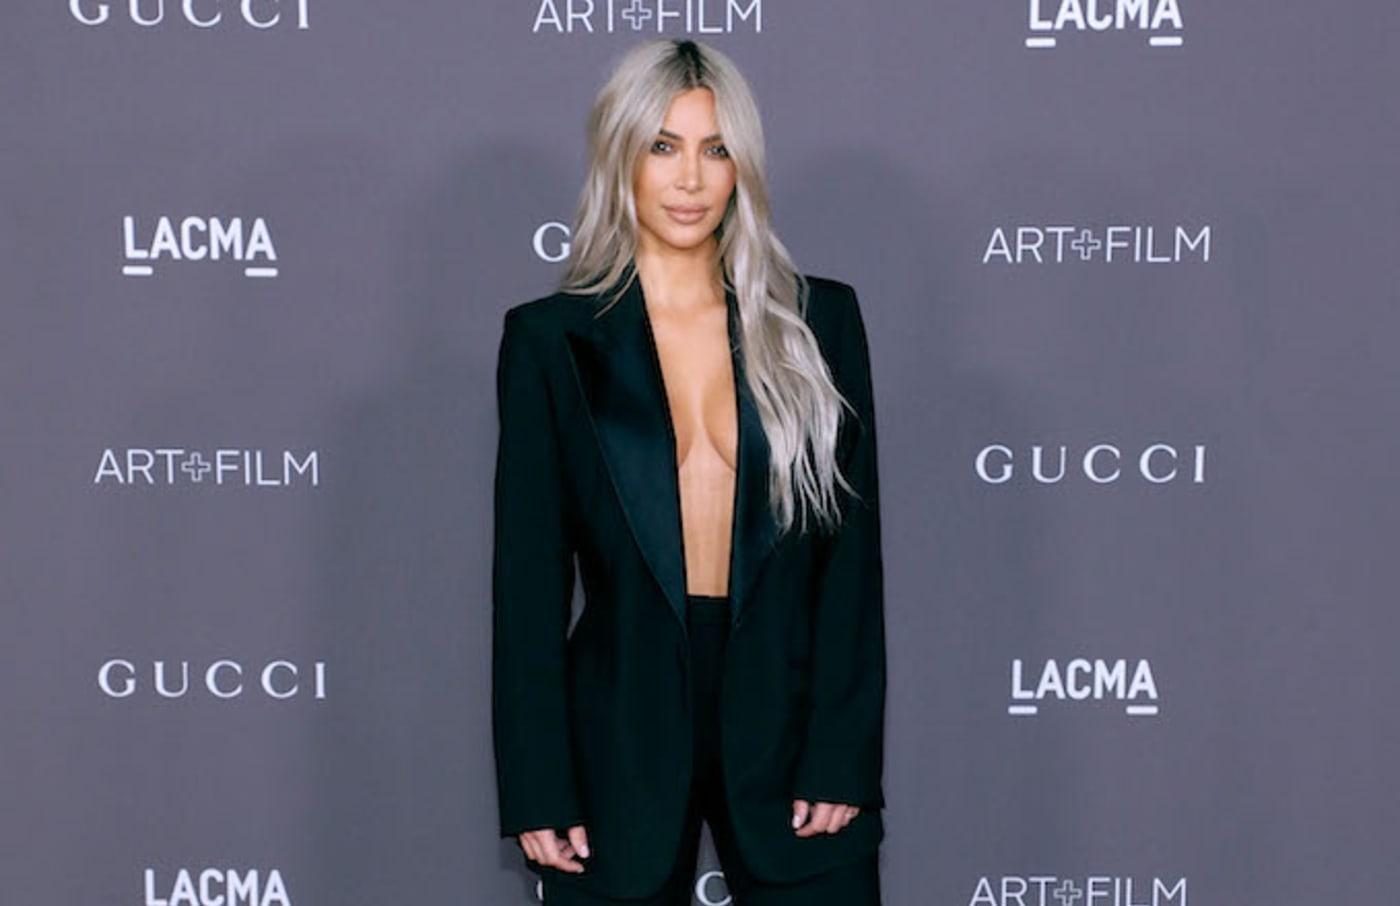 Kim Kardashian West attends the 2017 LACMA Art + Film Gala.